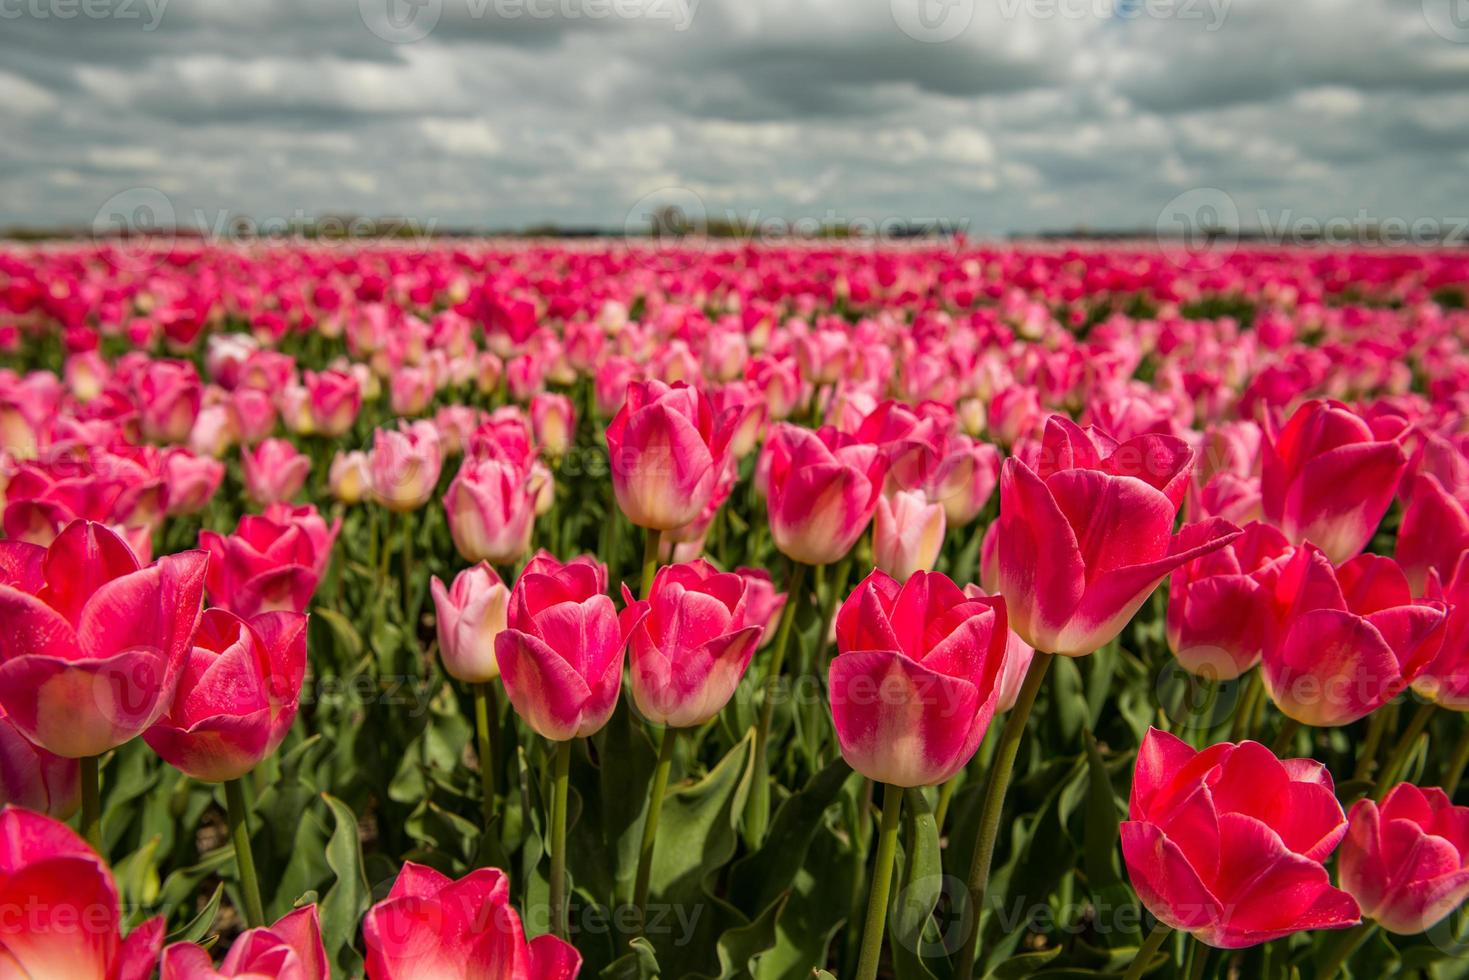 cultura tulipa, holanda foto